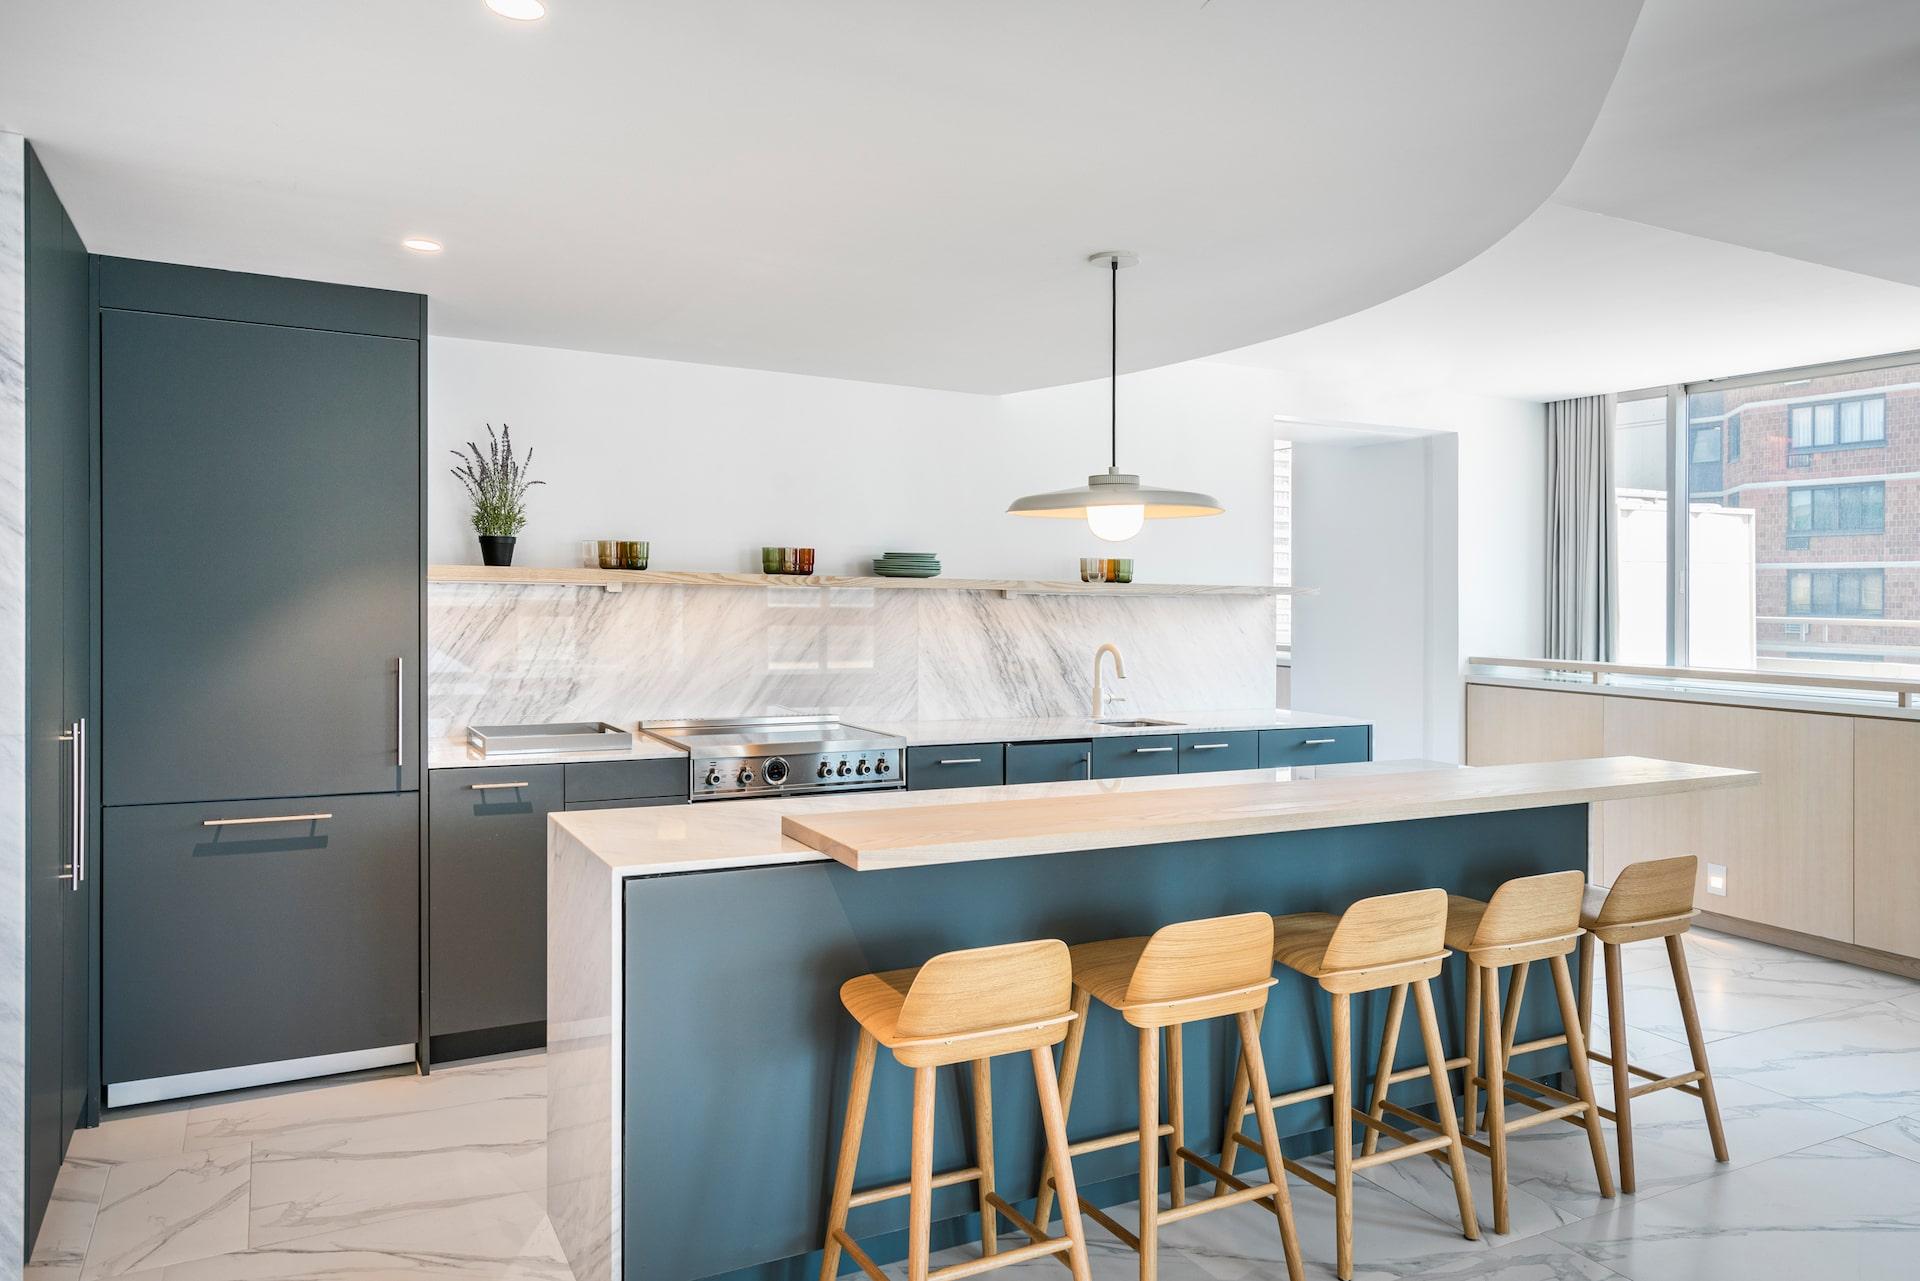 101 West End Avenue Amenities kitchen